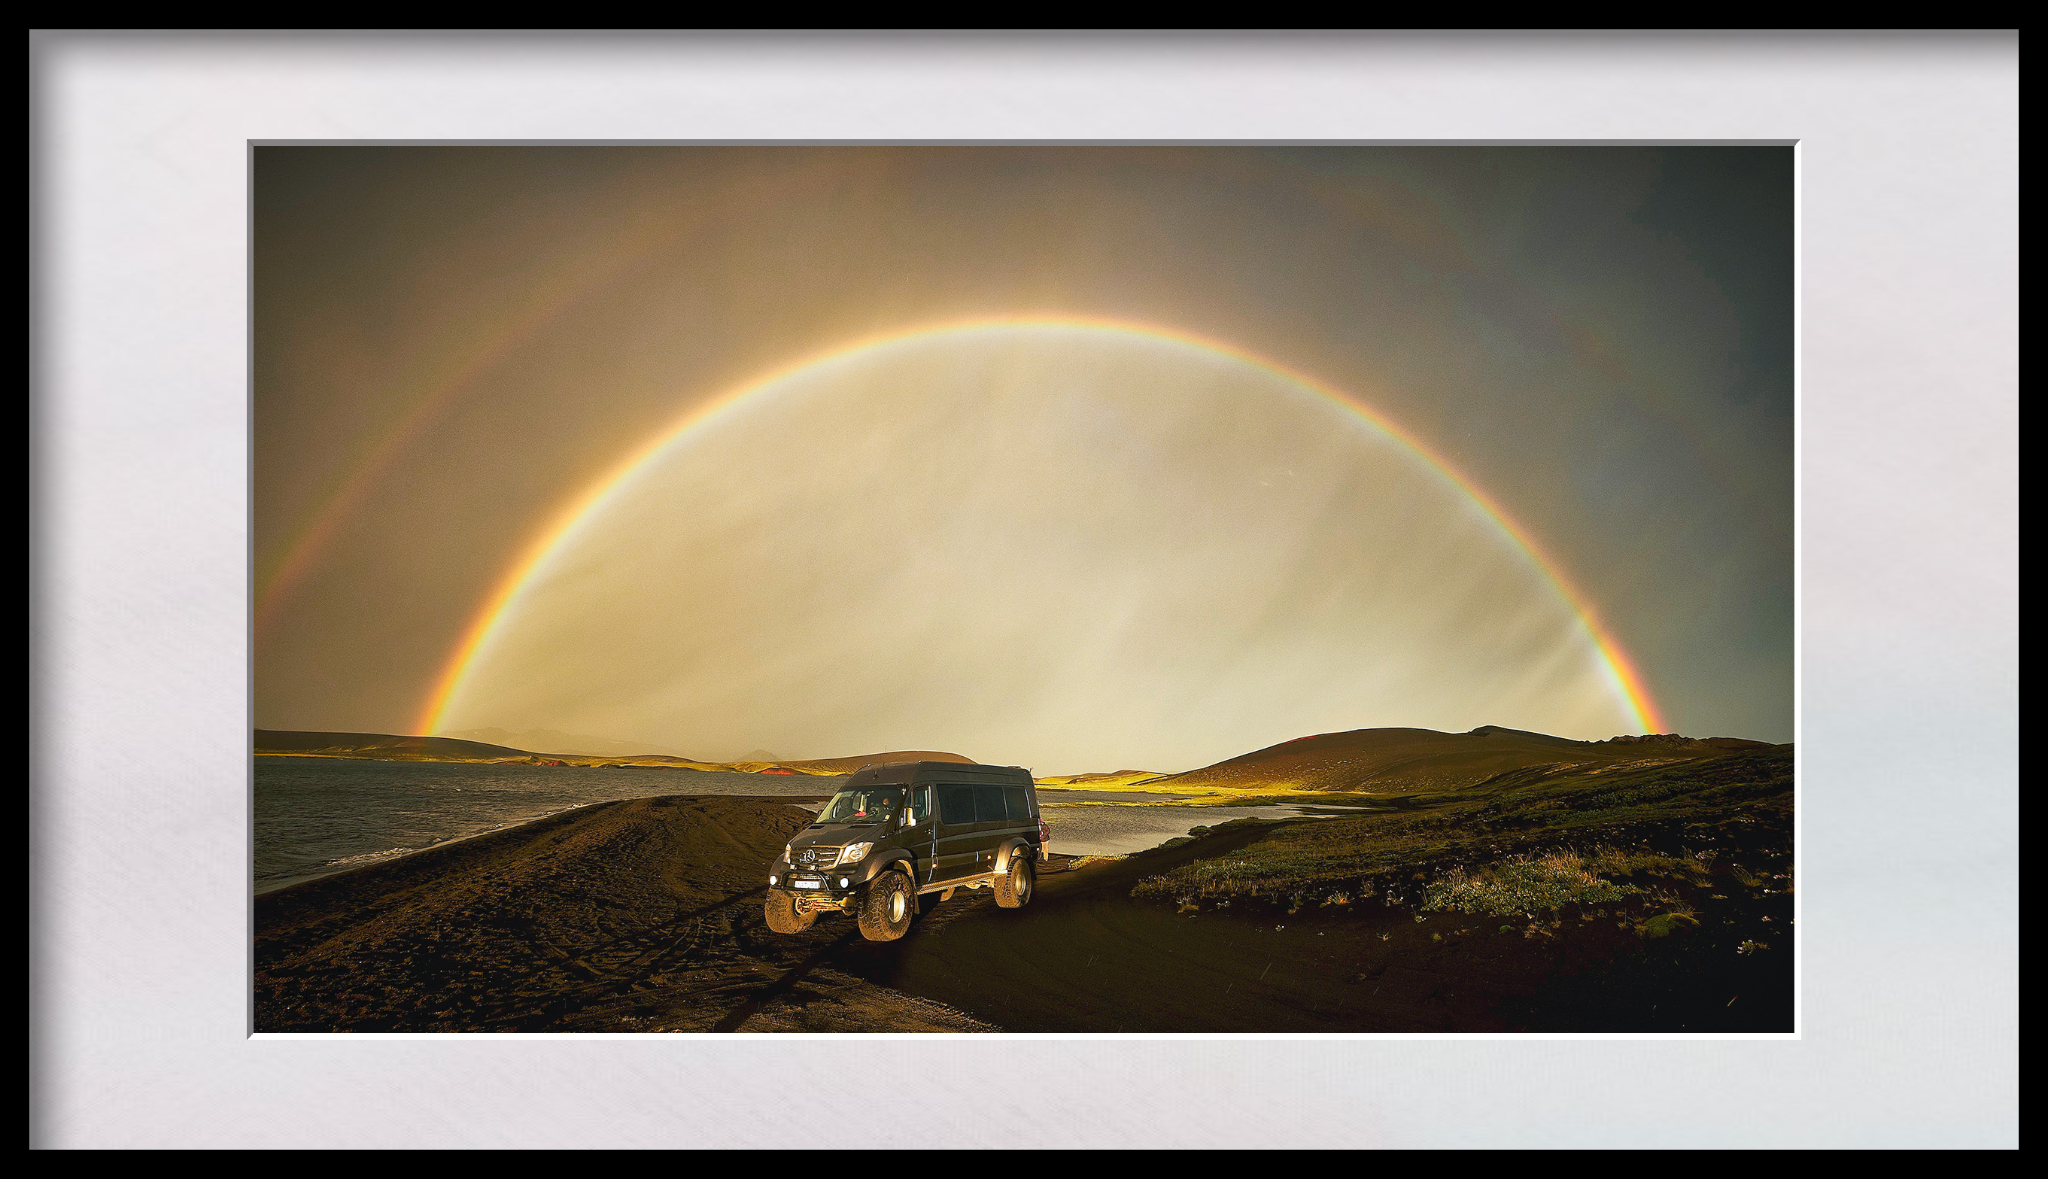 Under the rainbow in Iceland